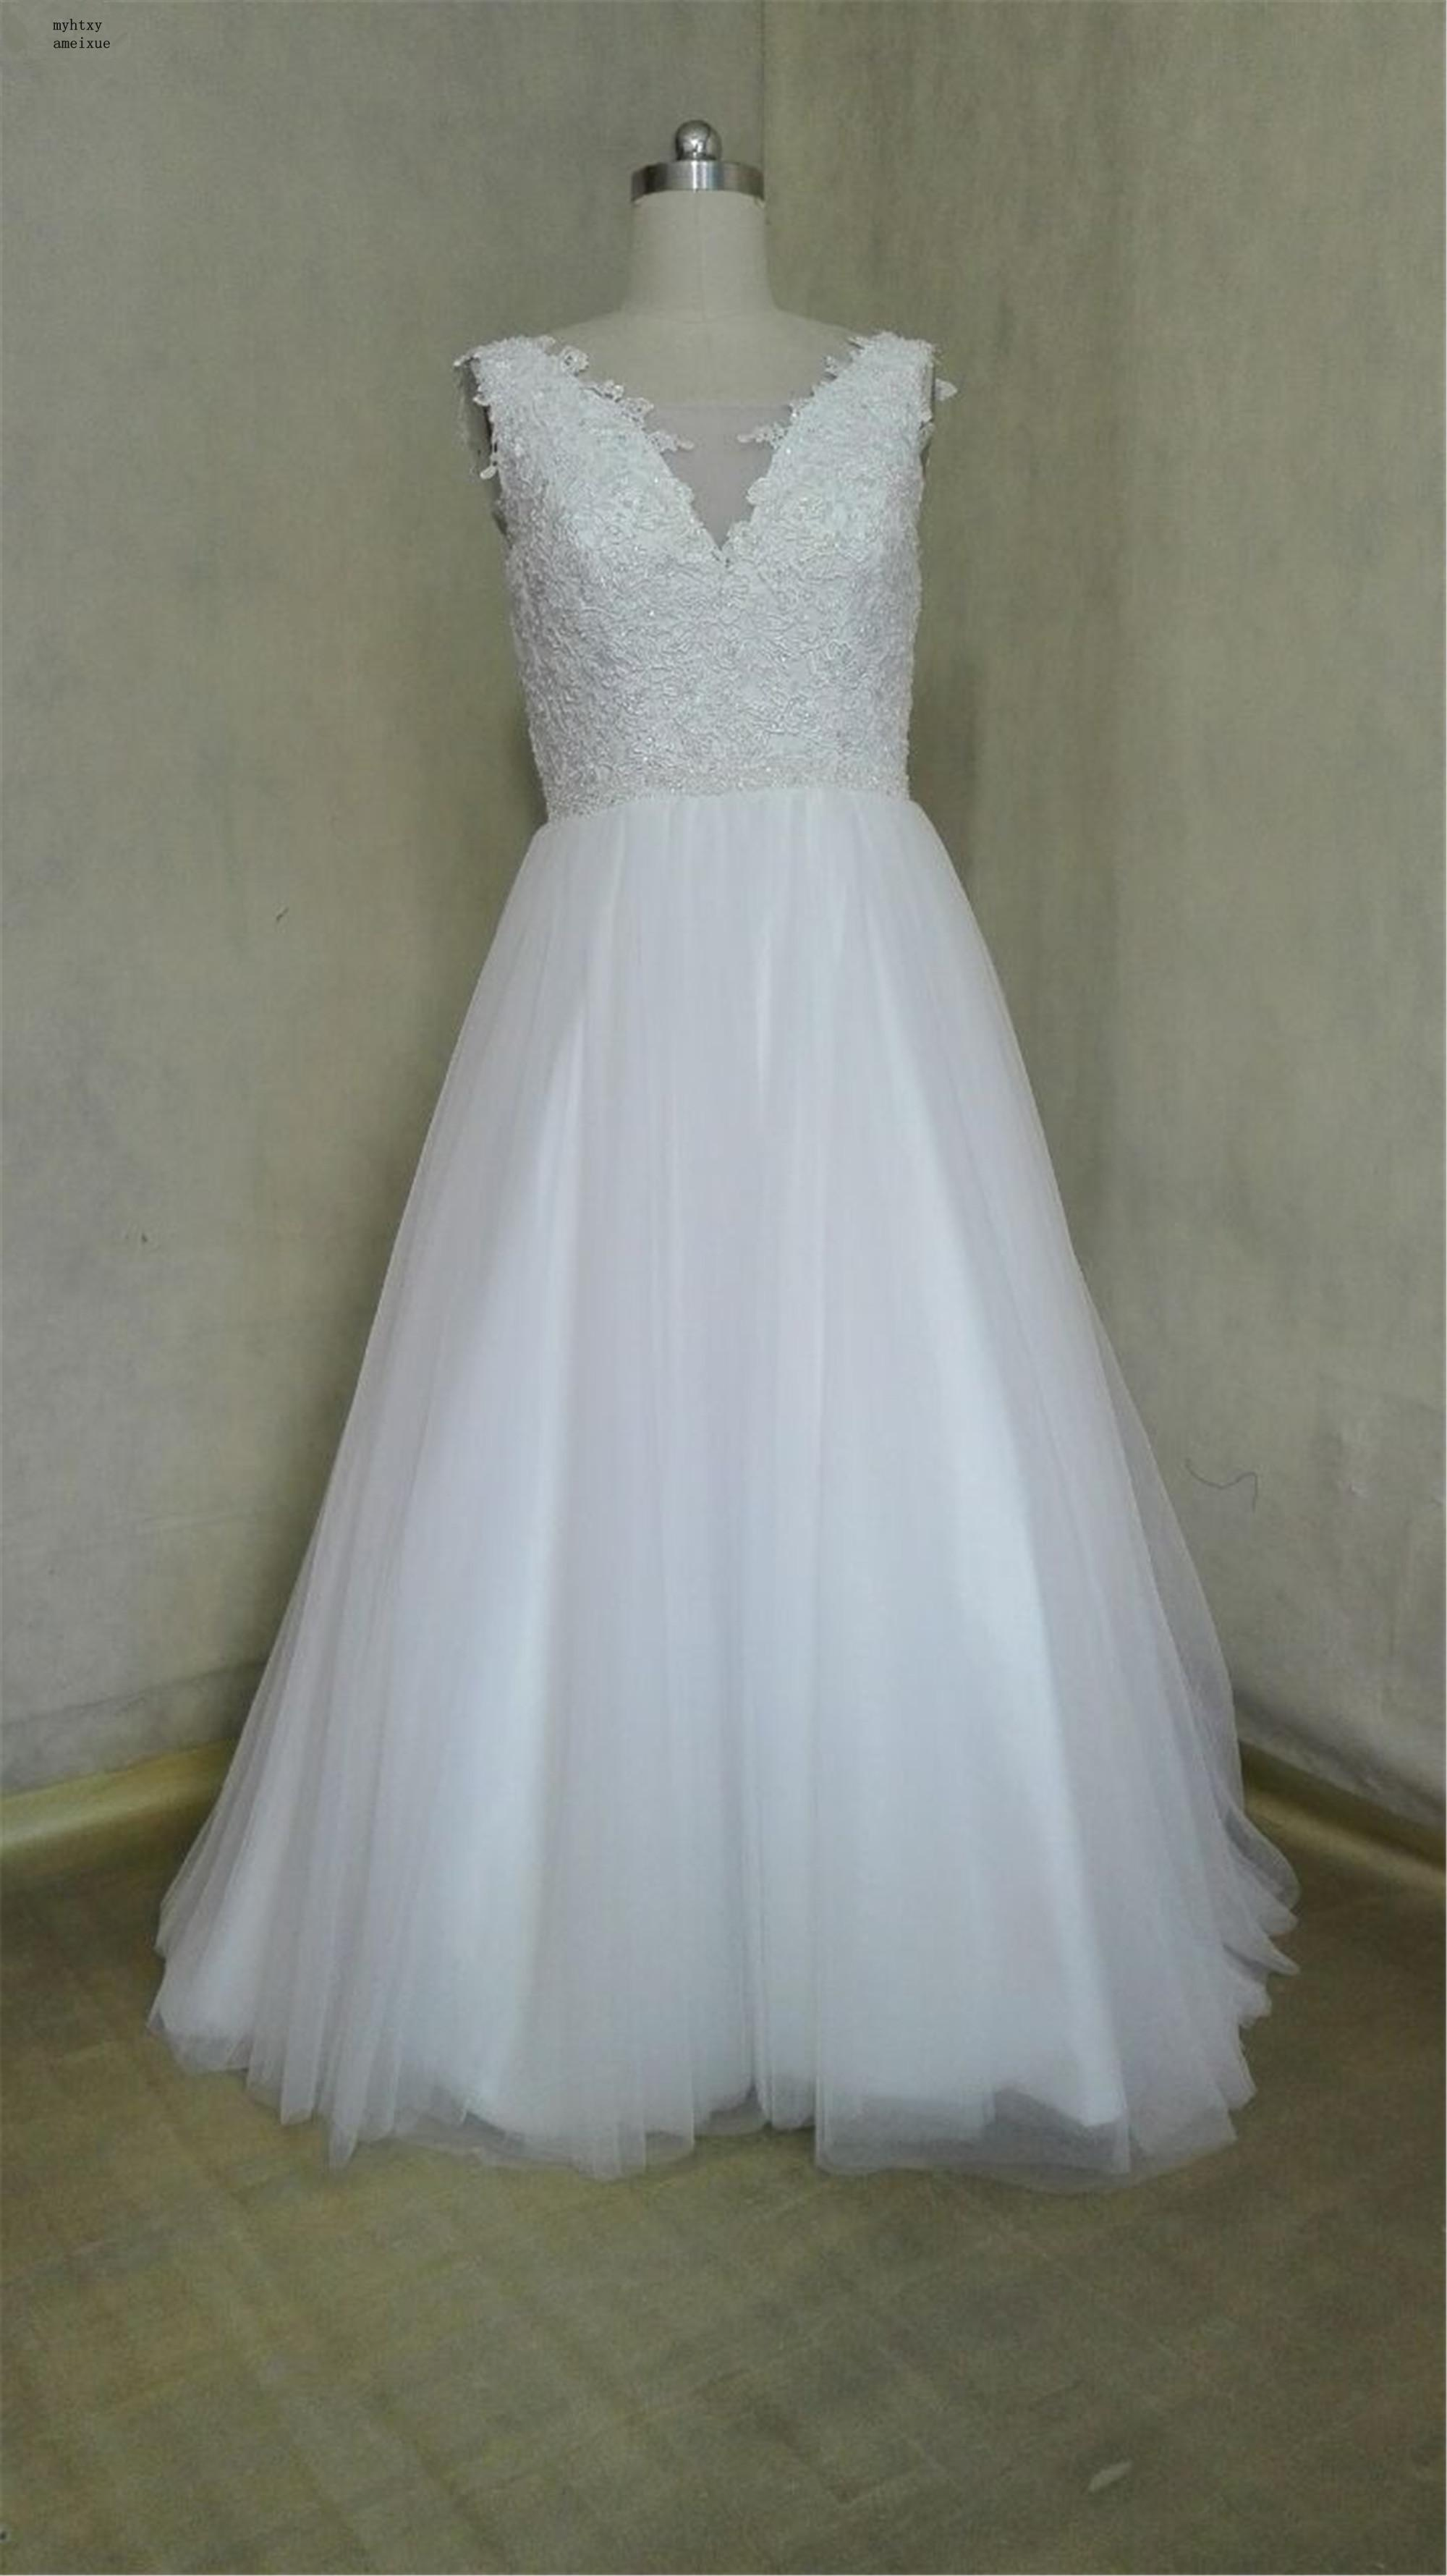 Awesome Aliexpress Wedding Dresses Plus Size – Wedding